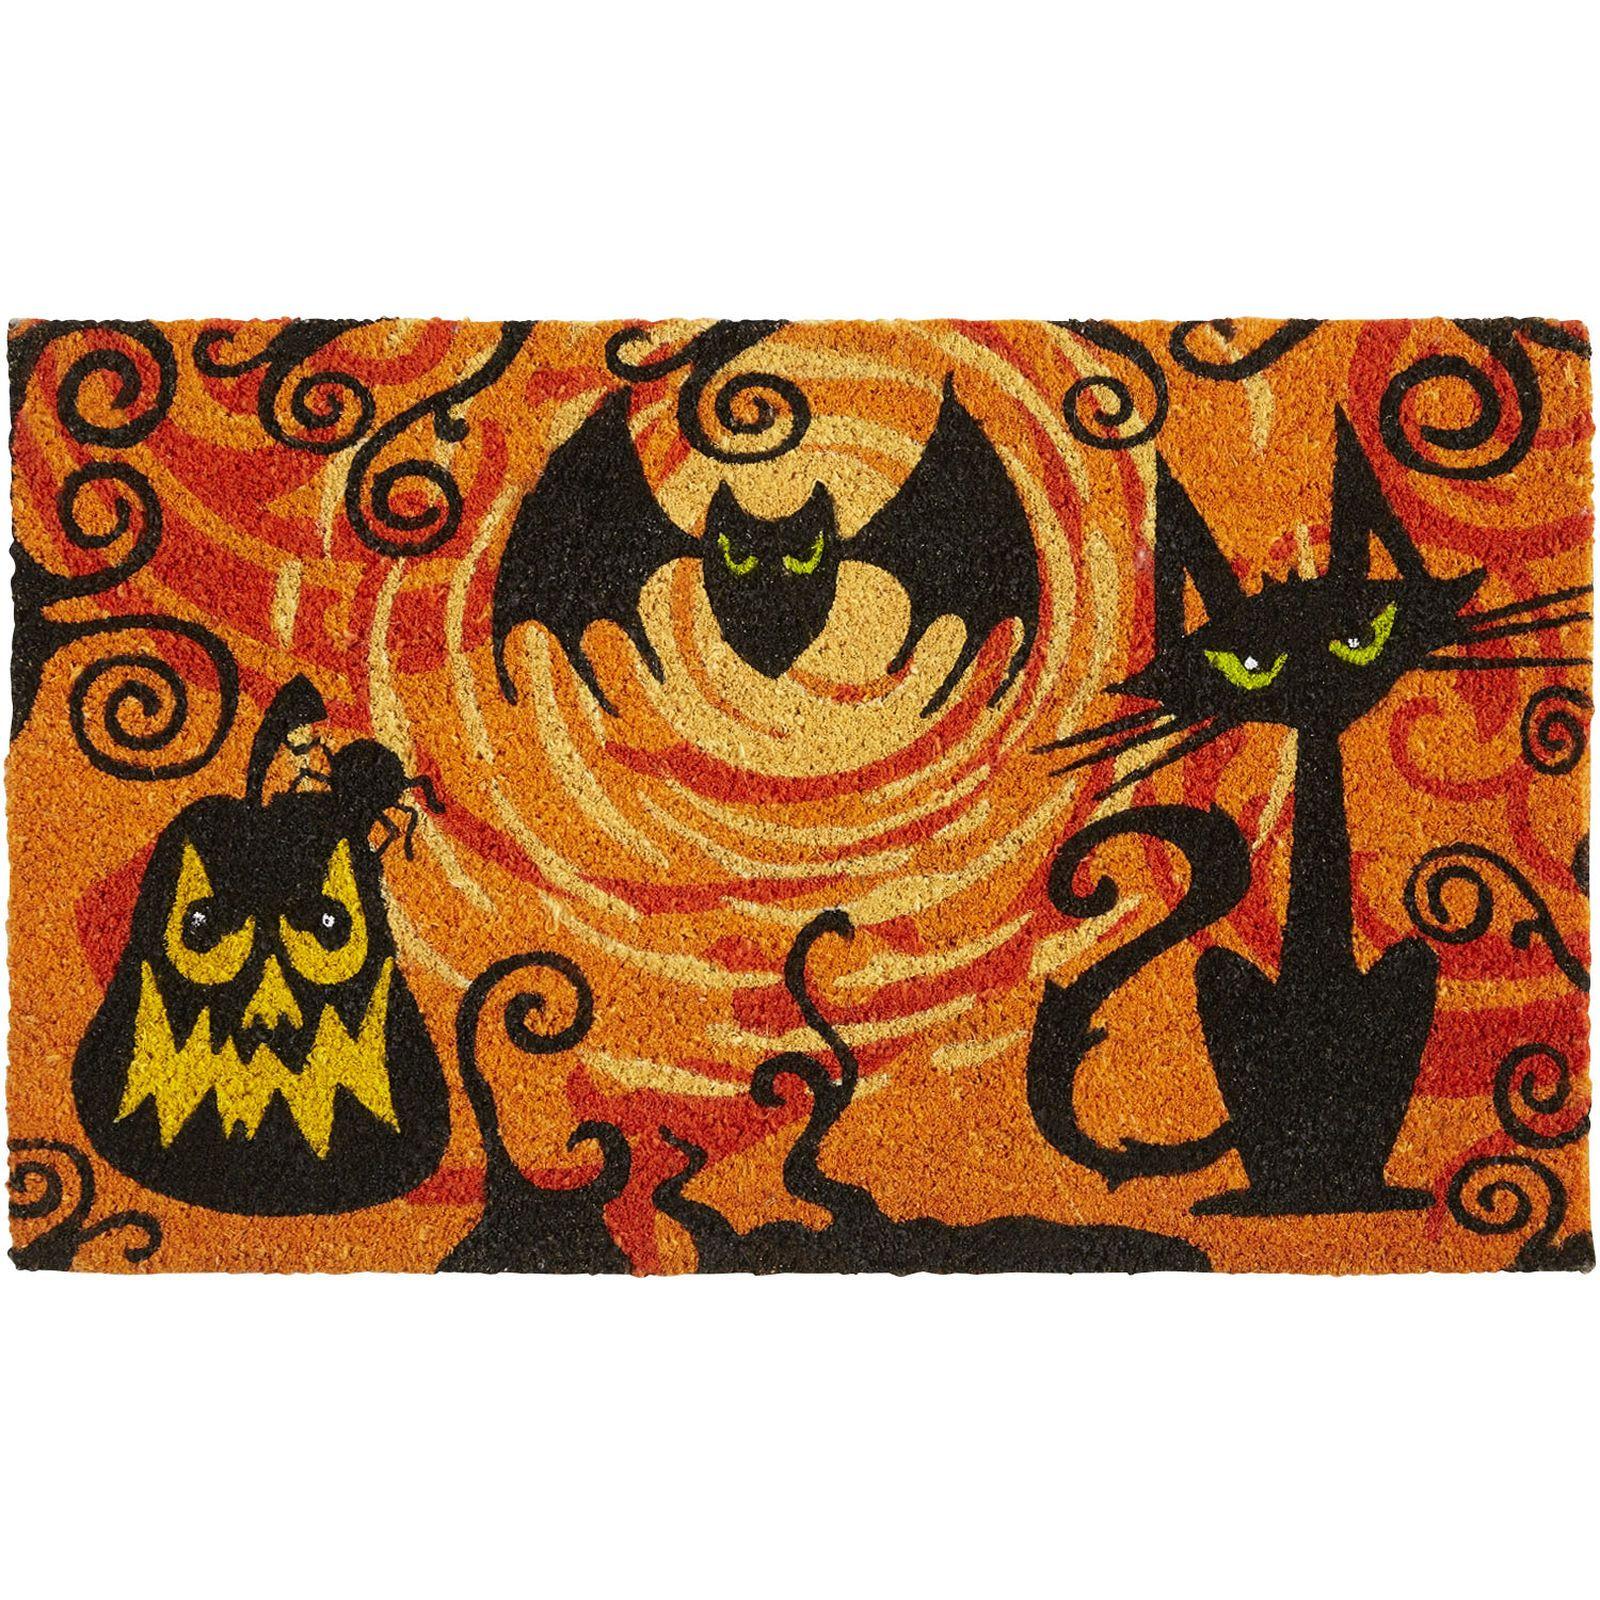 scary kitty bat doormat pier 1 imports - Pier 1 Halloween